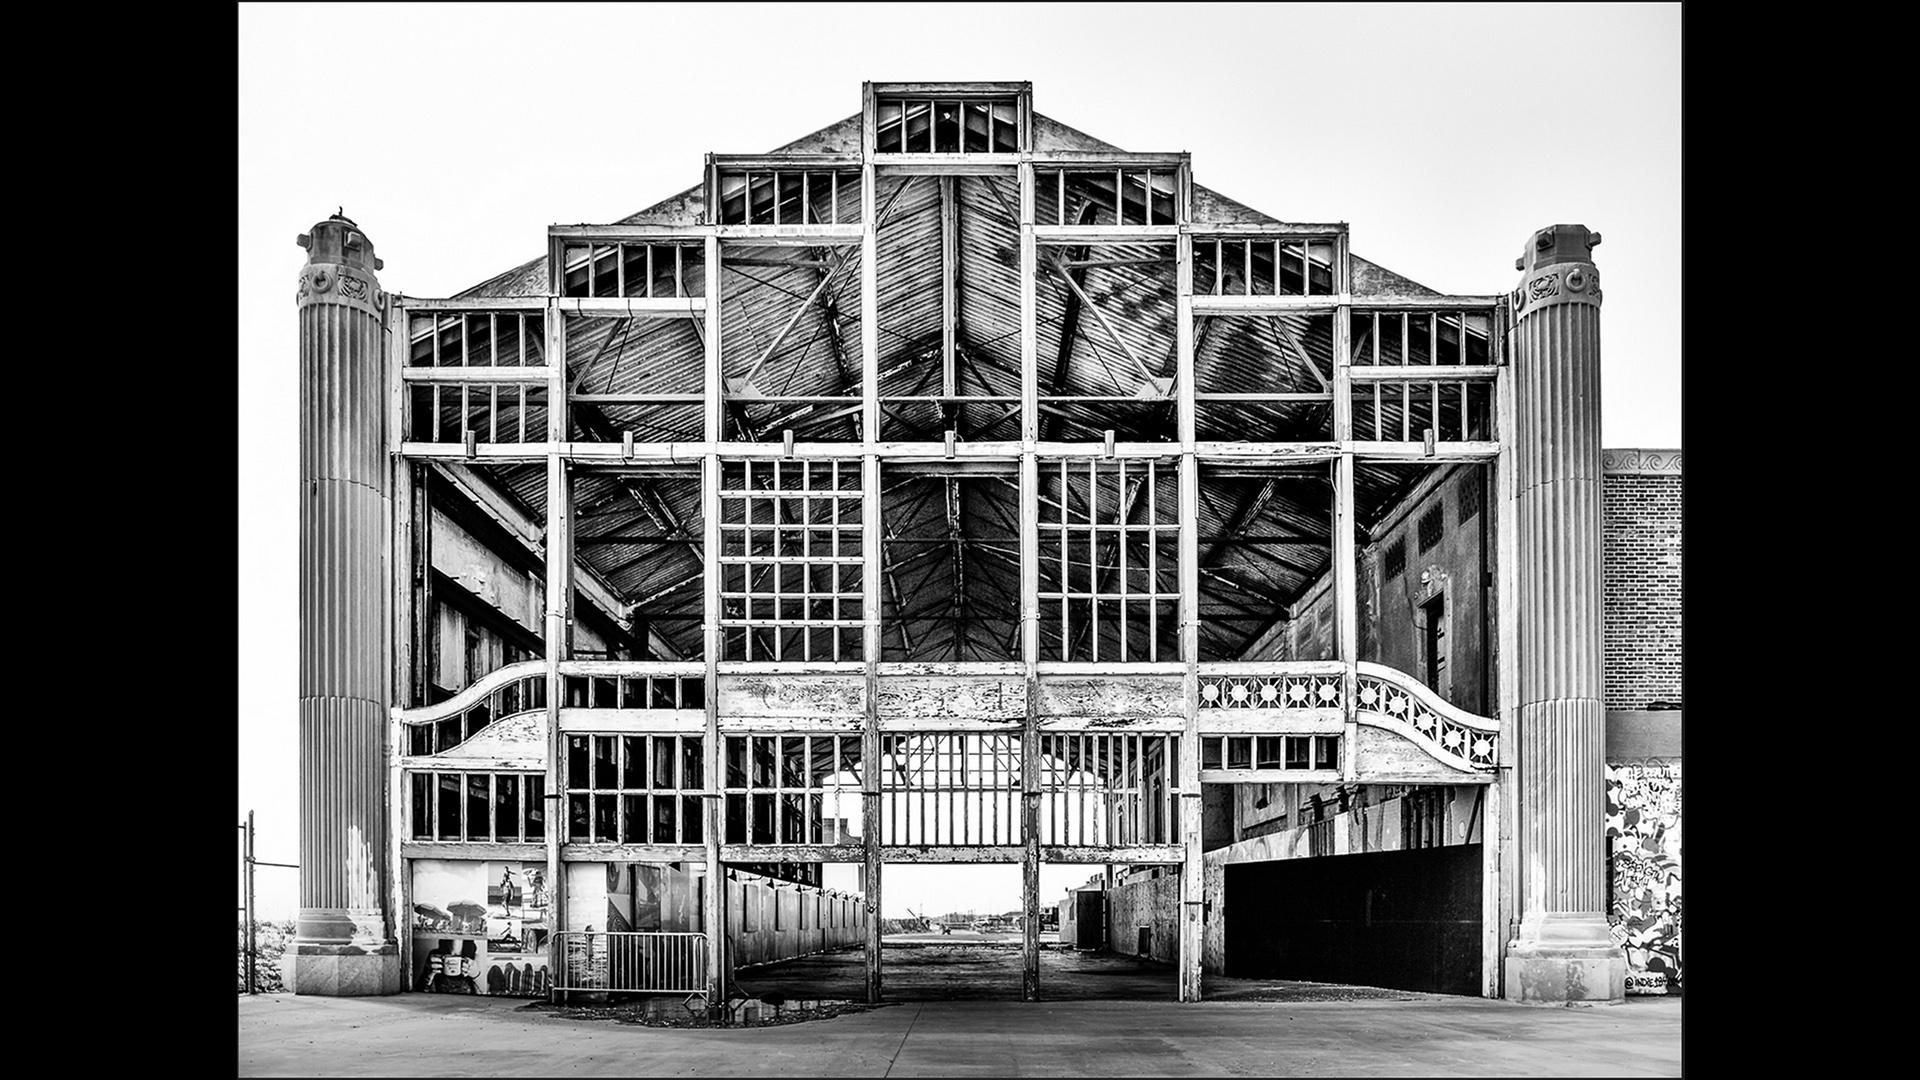 Architecture | Photographer: Steve StangerCurator: Steven Inglima